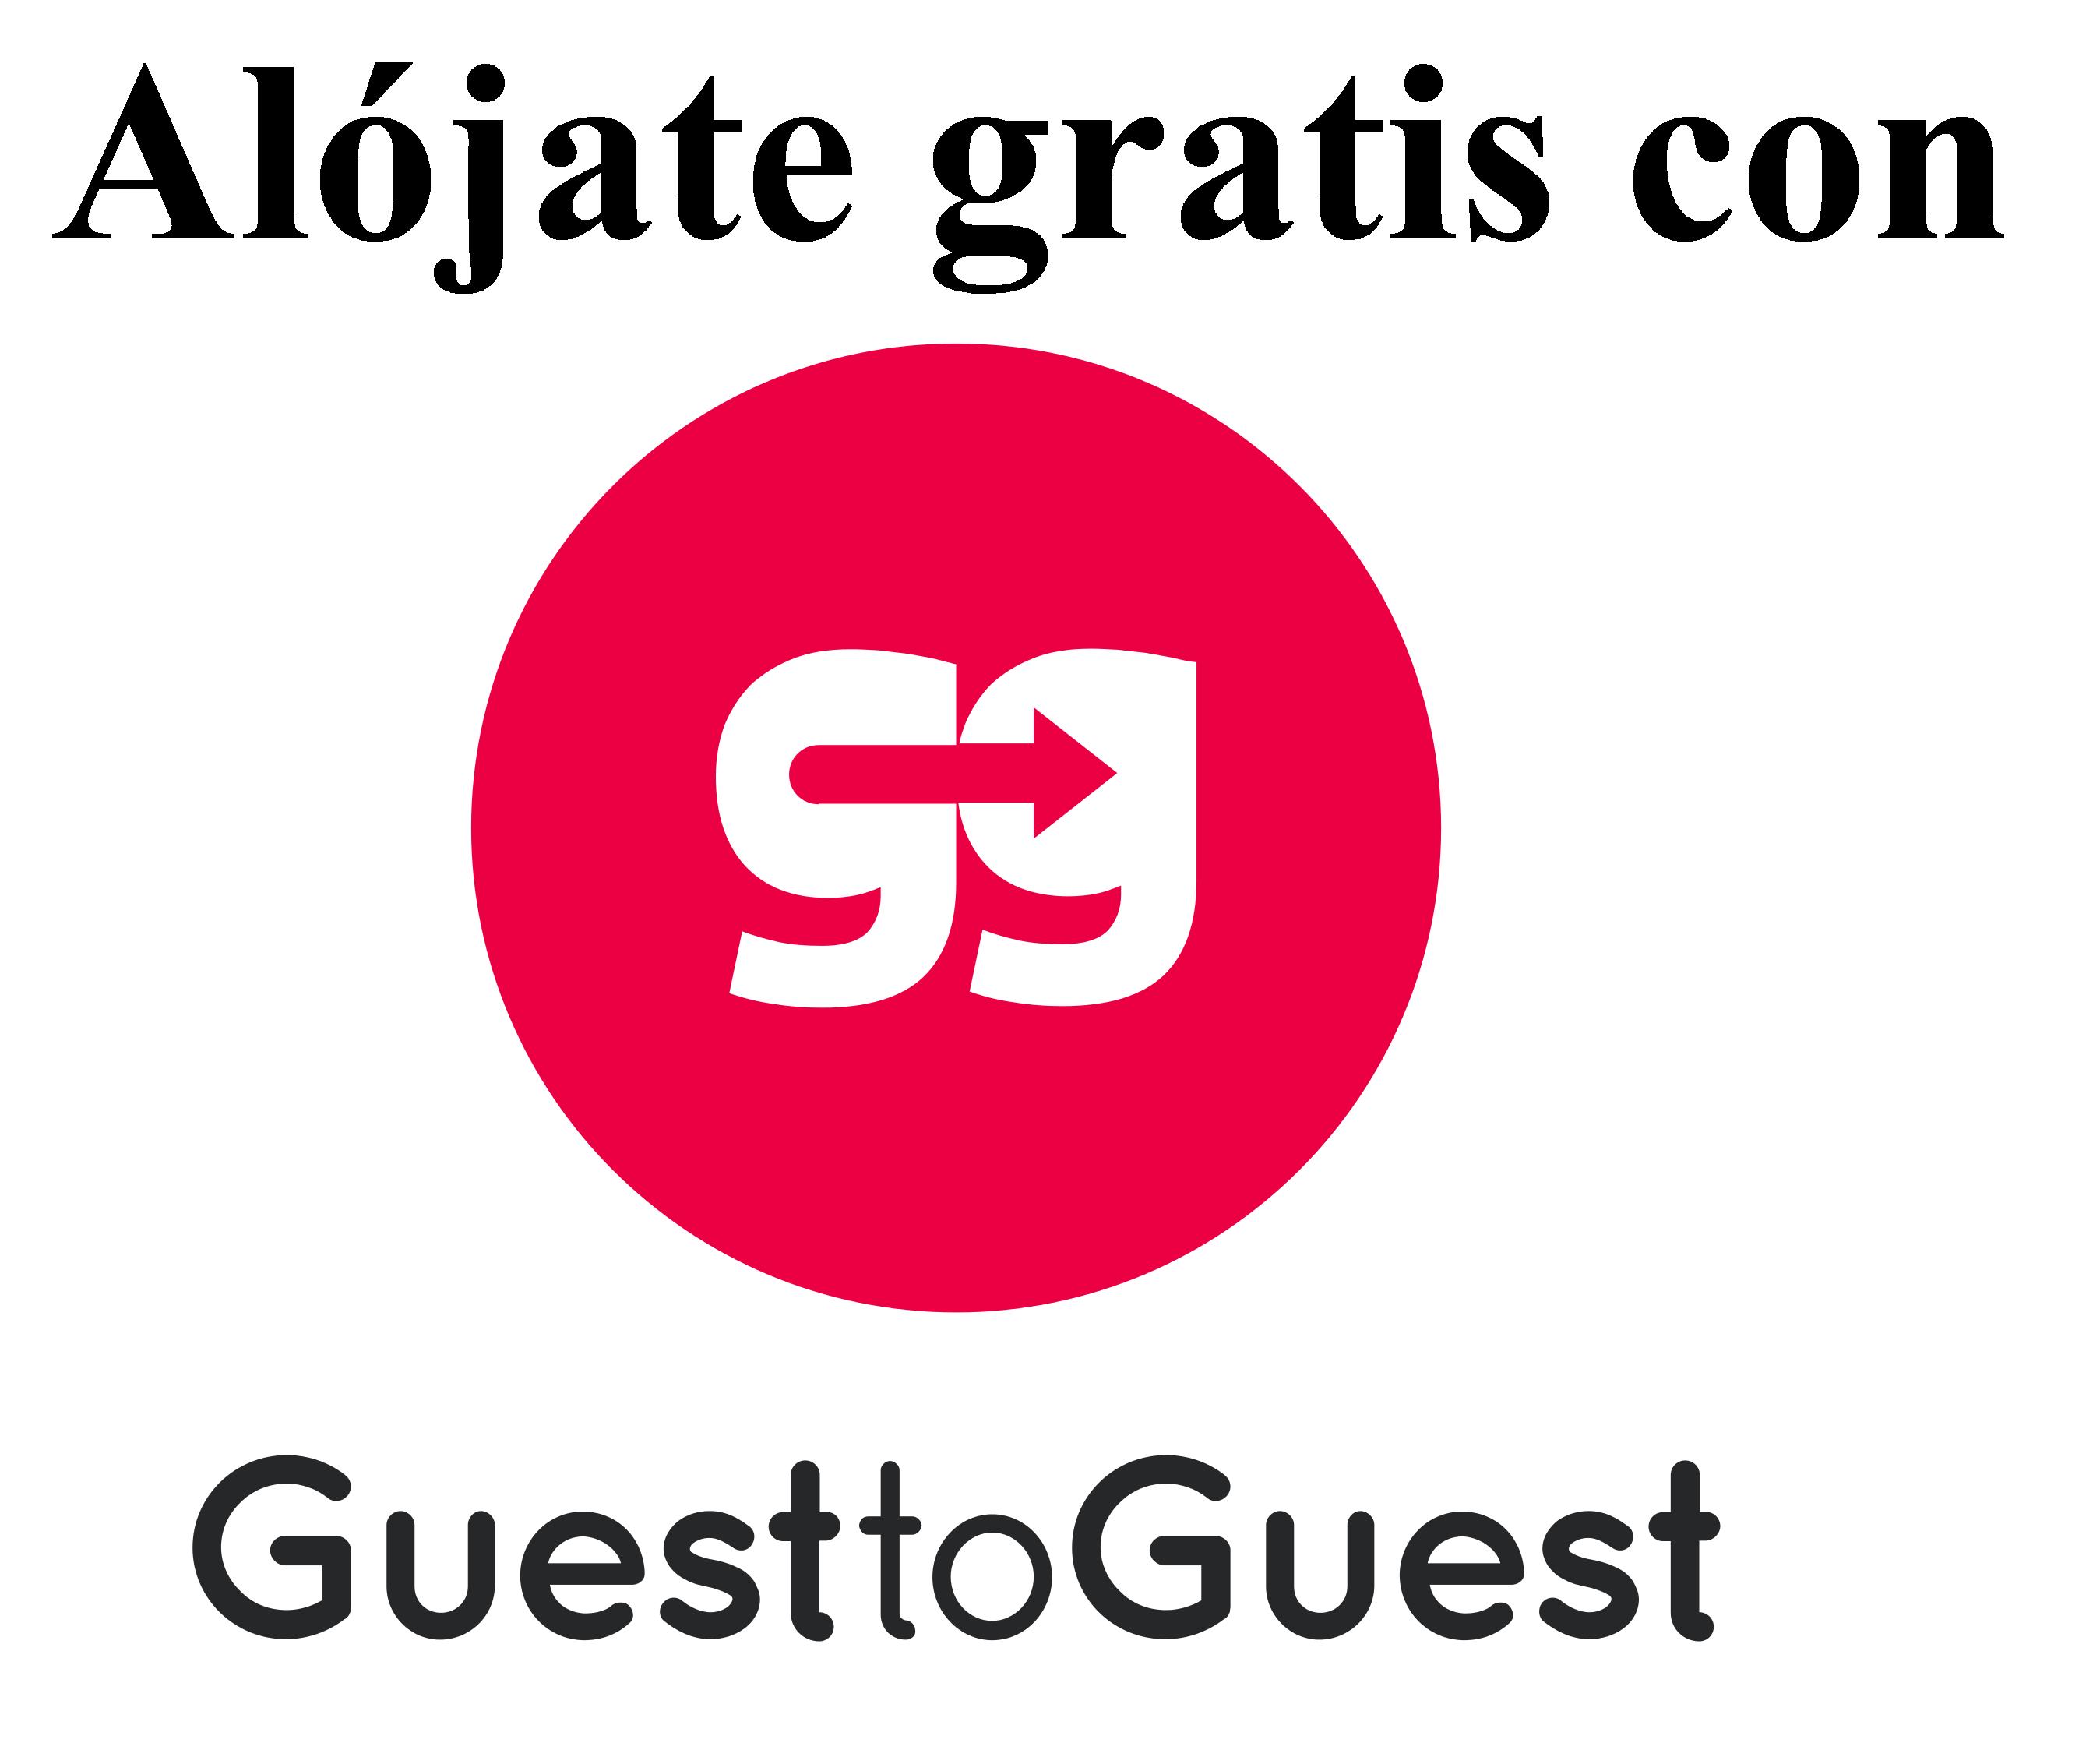 Alojarte Gratis con GuestToGuest